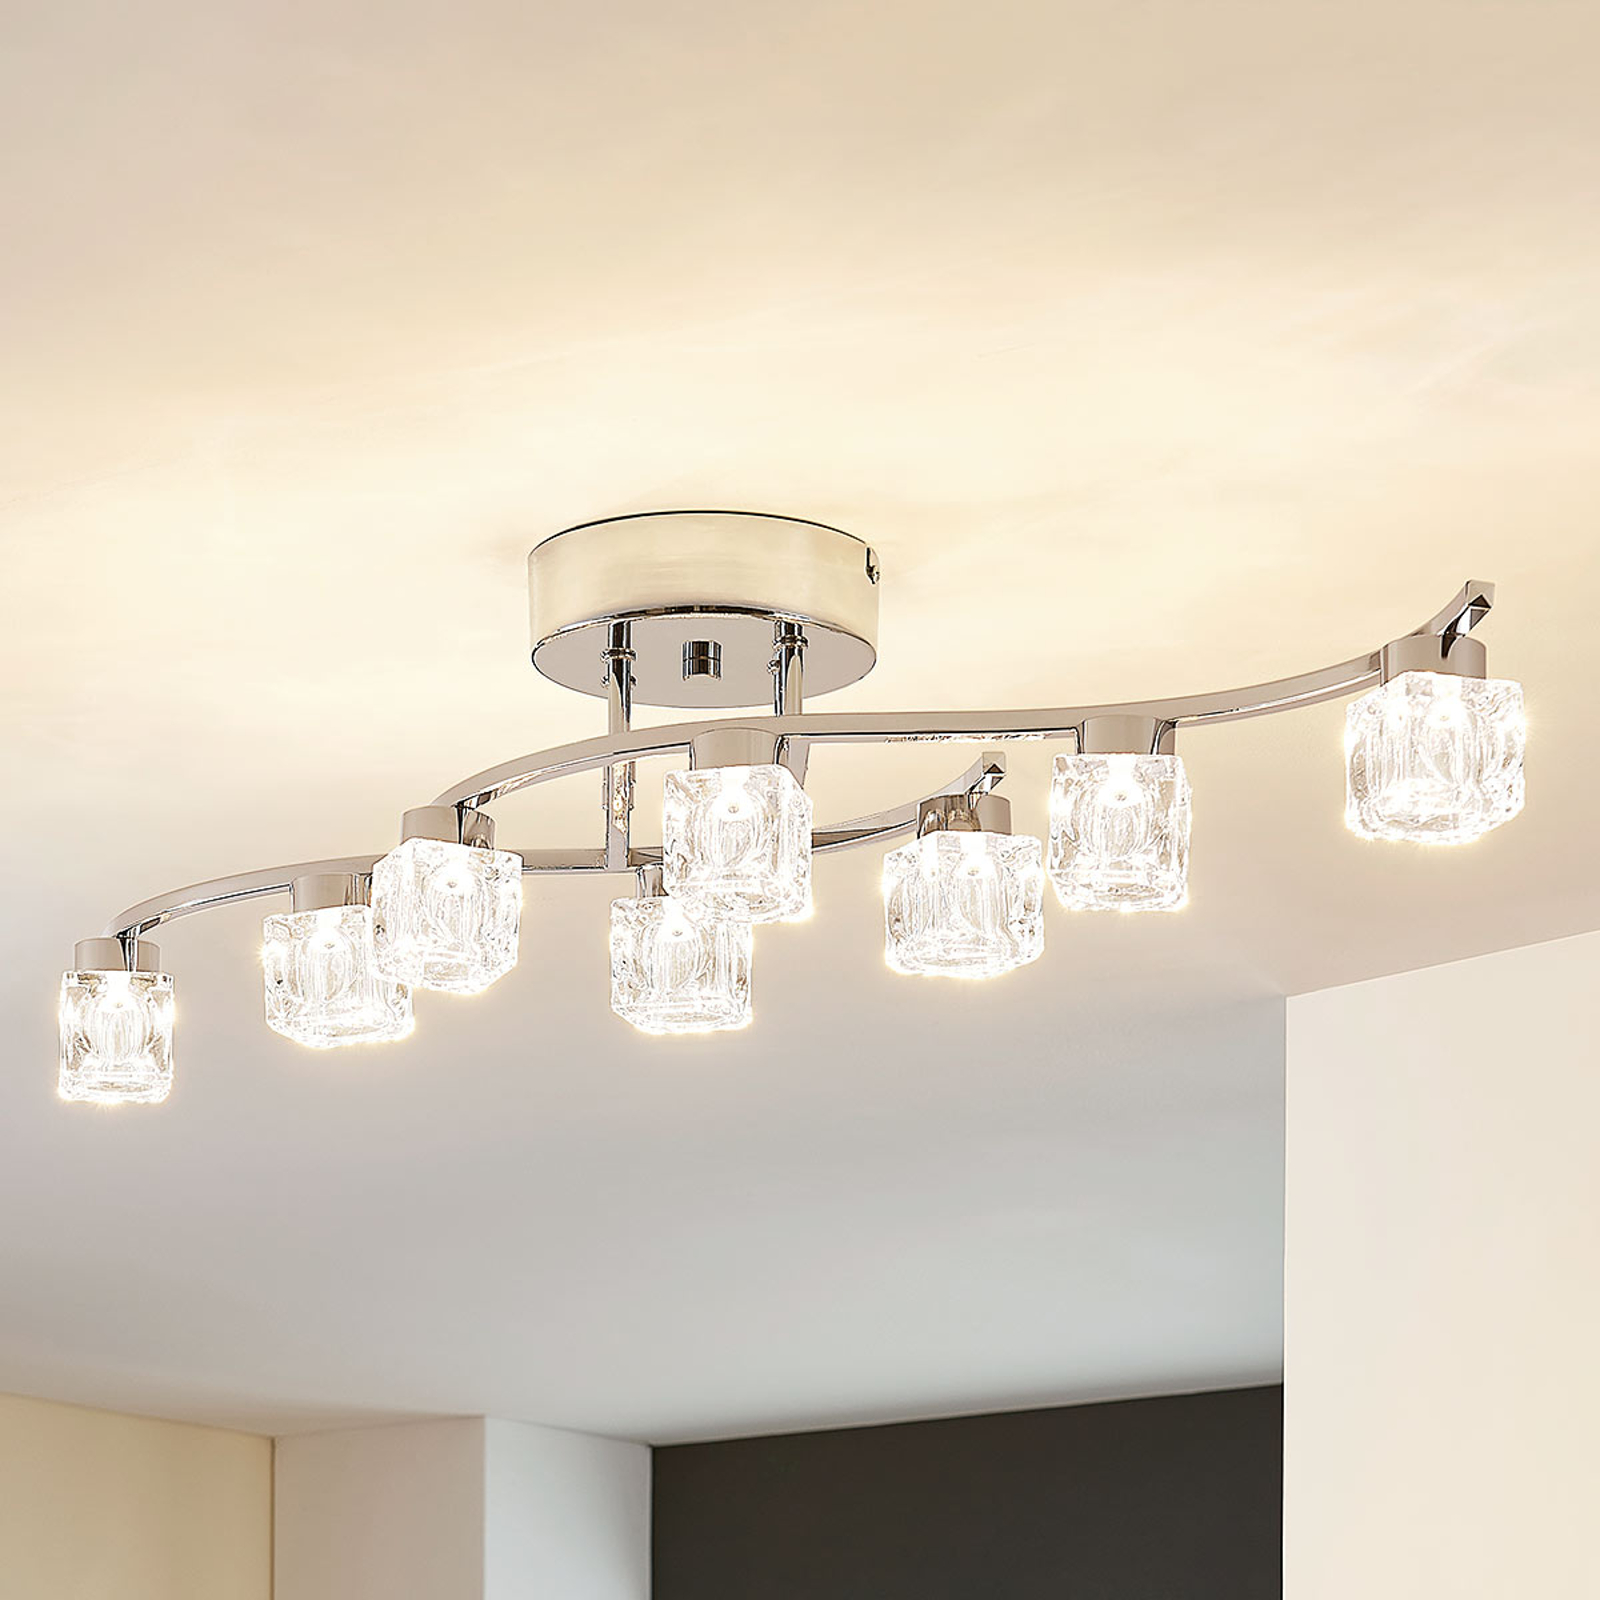 Hilfe meine dimmbare LED Leuchte flackert | Der LED Profi